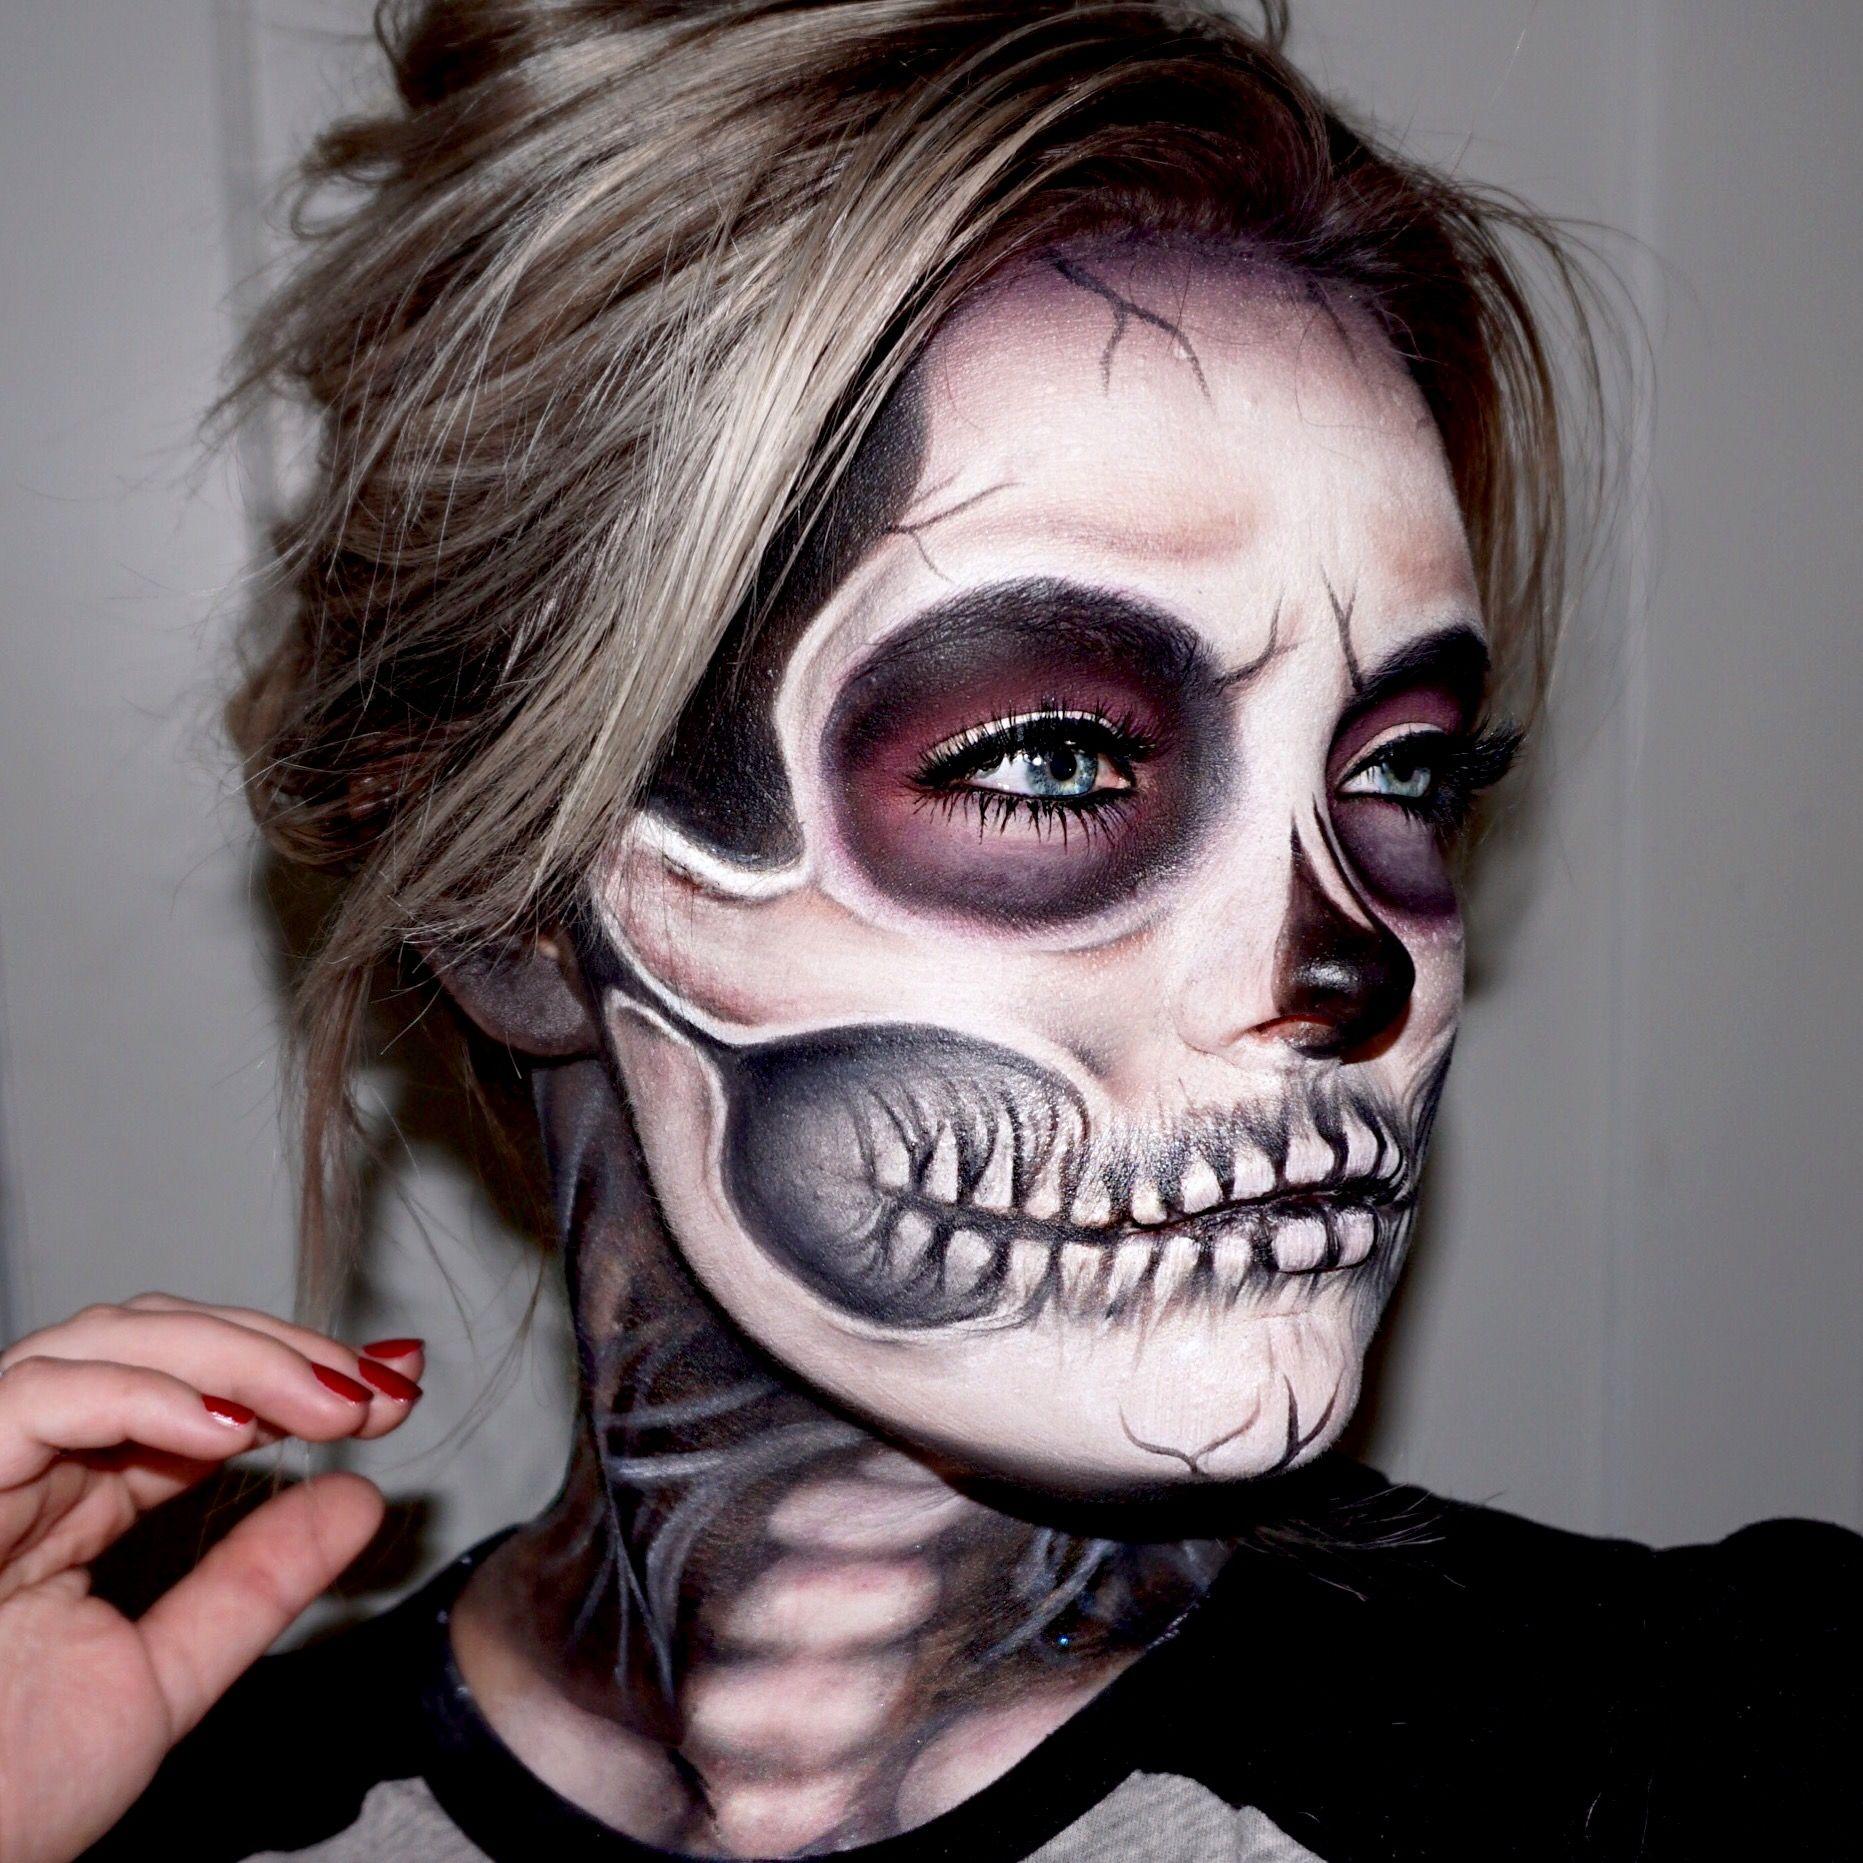 Jason Aldean Defends His Blackface Halloween Costume